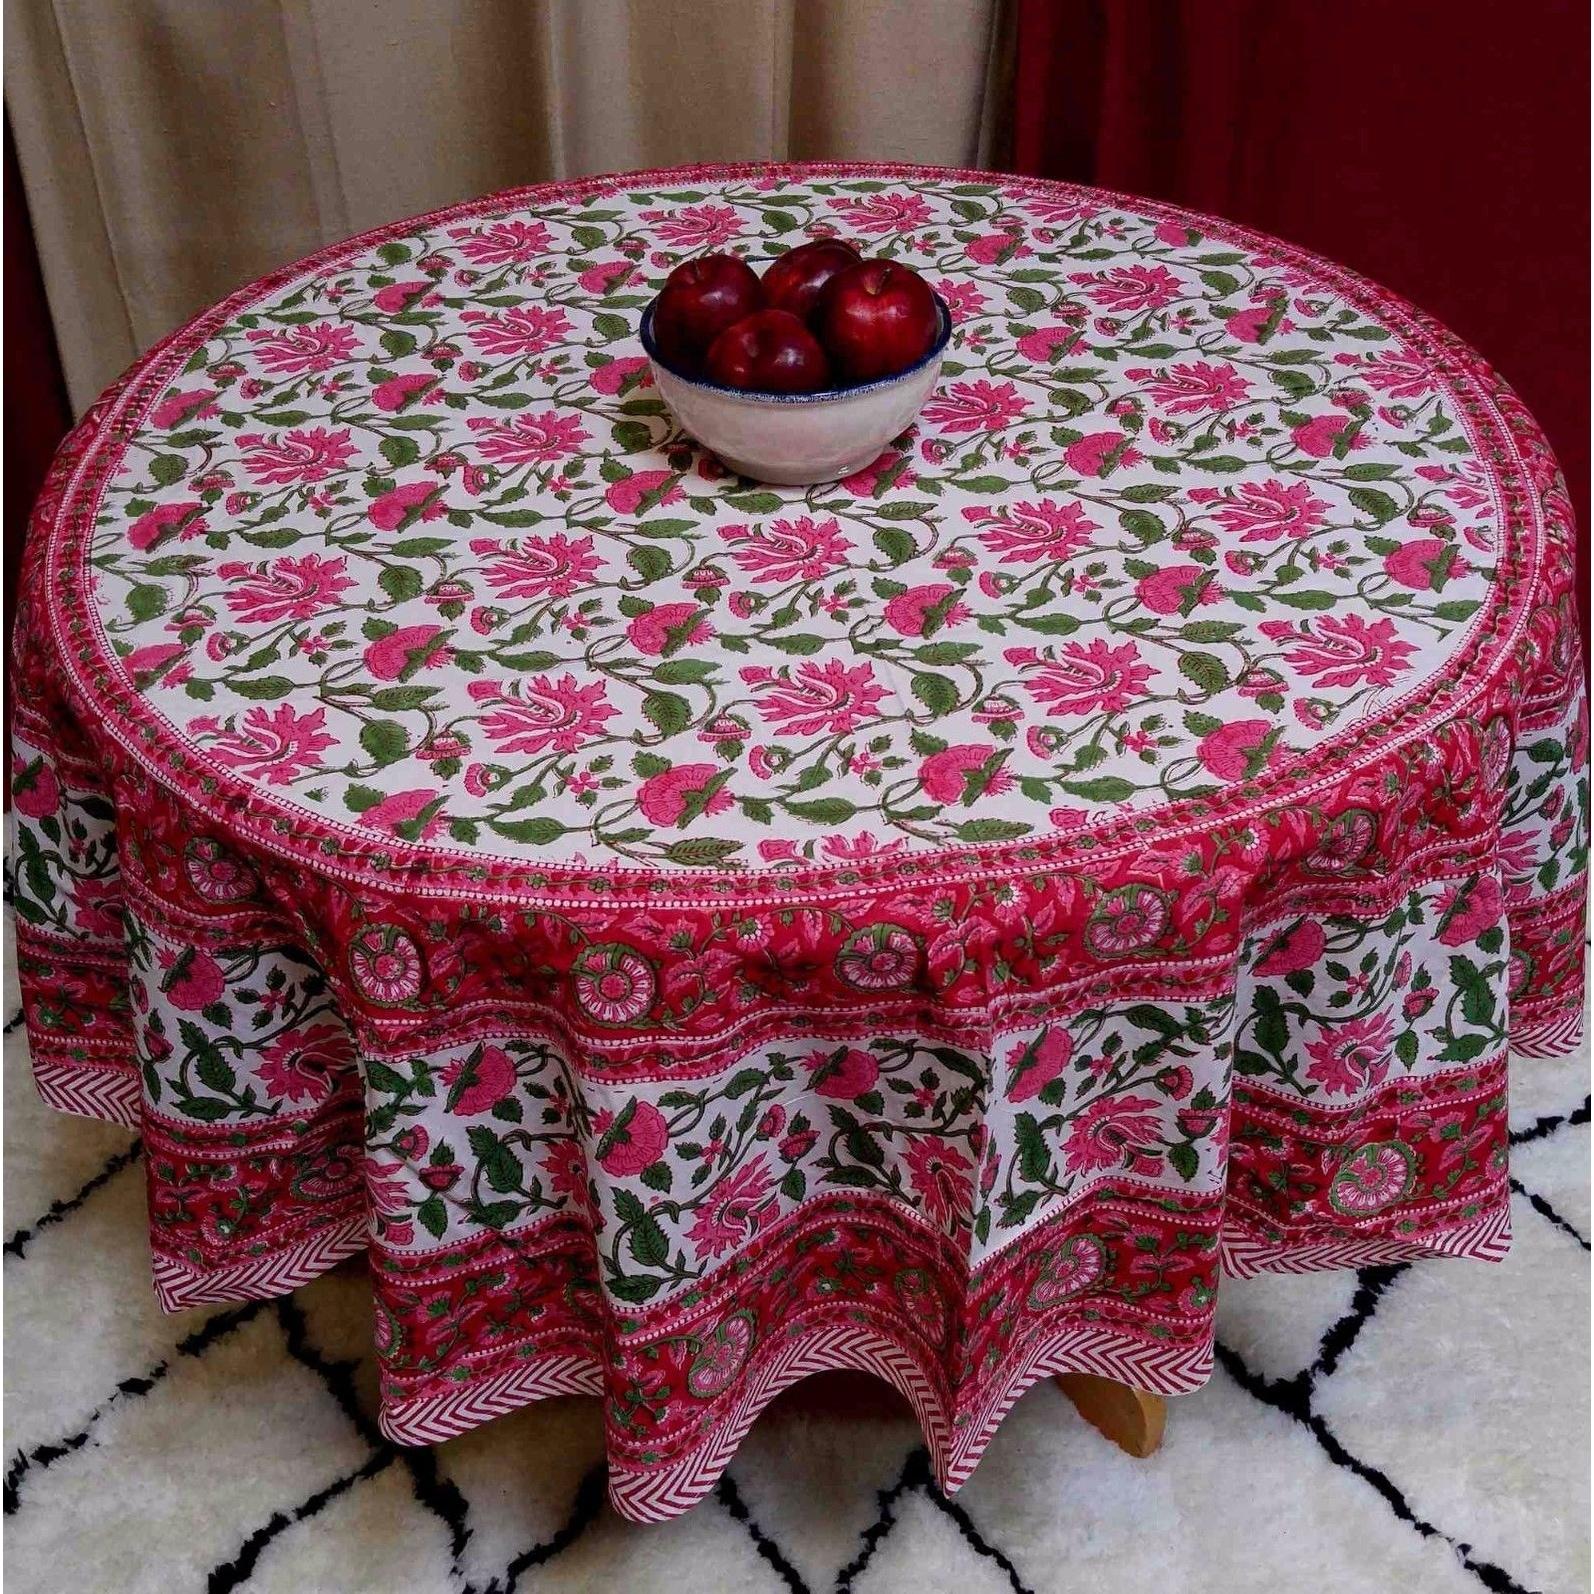 Handmade Lotus Flower Block Print Round Tablecloth Rectangular Cotton Red,